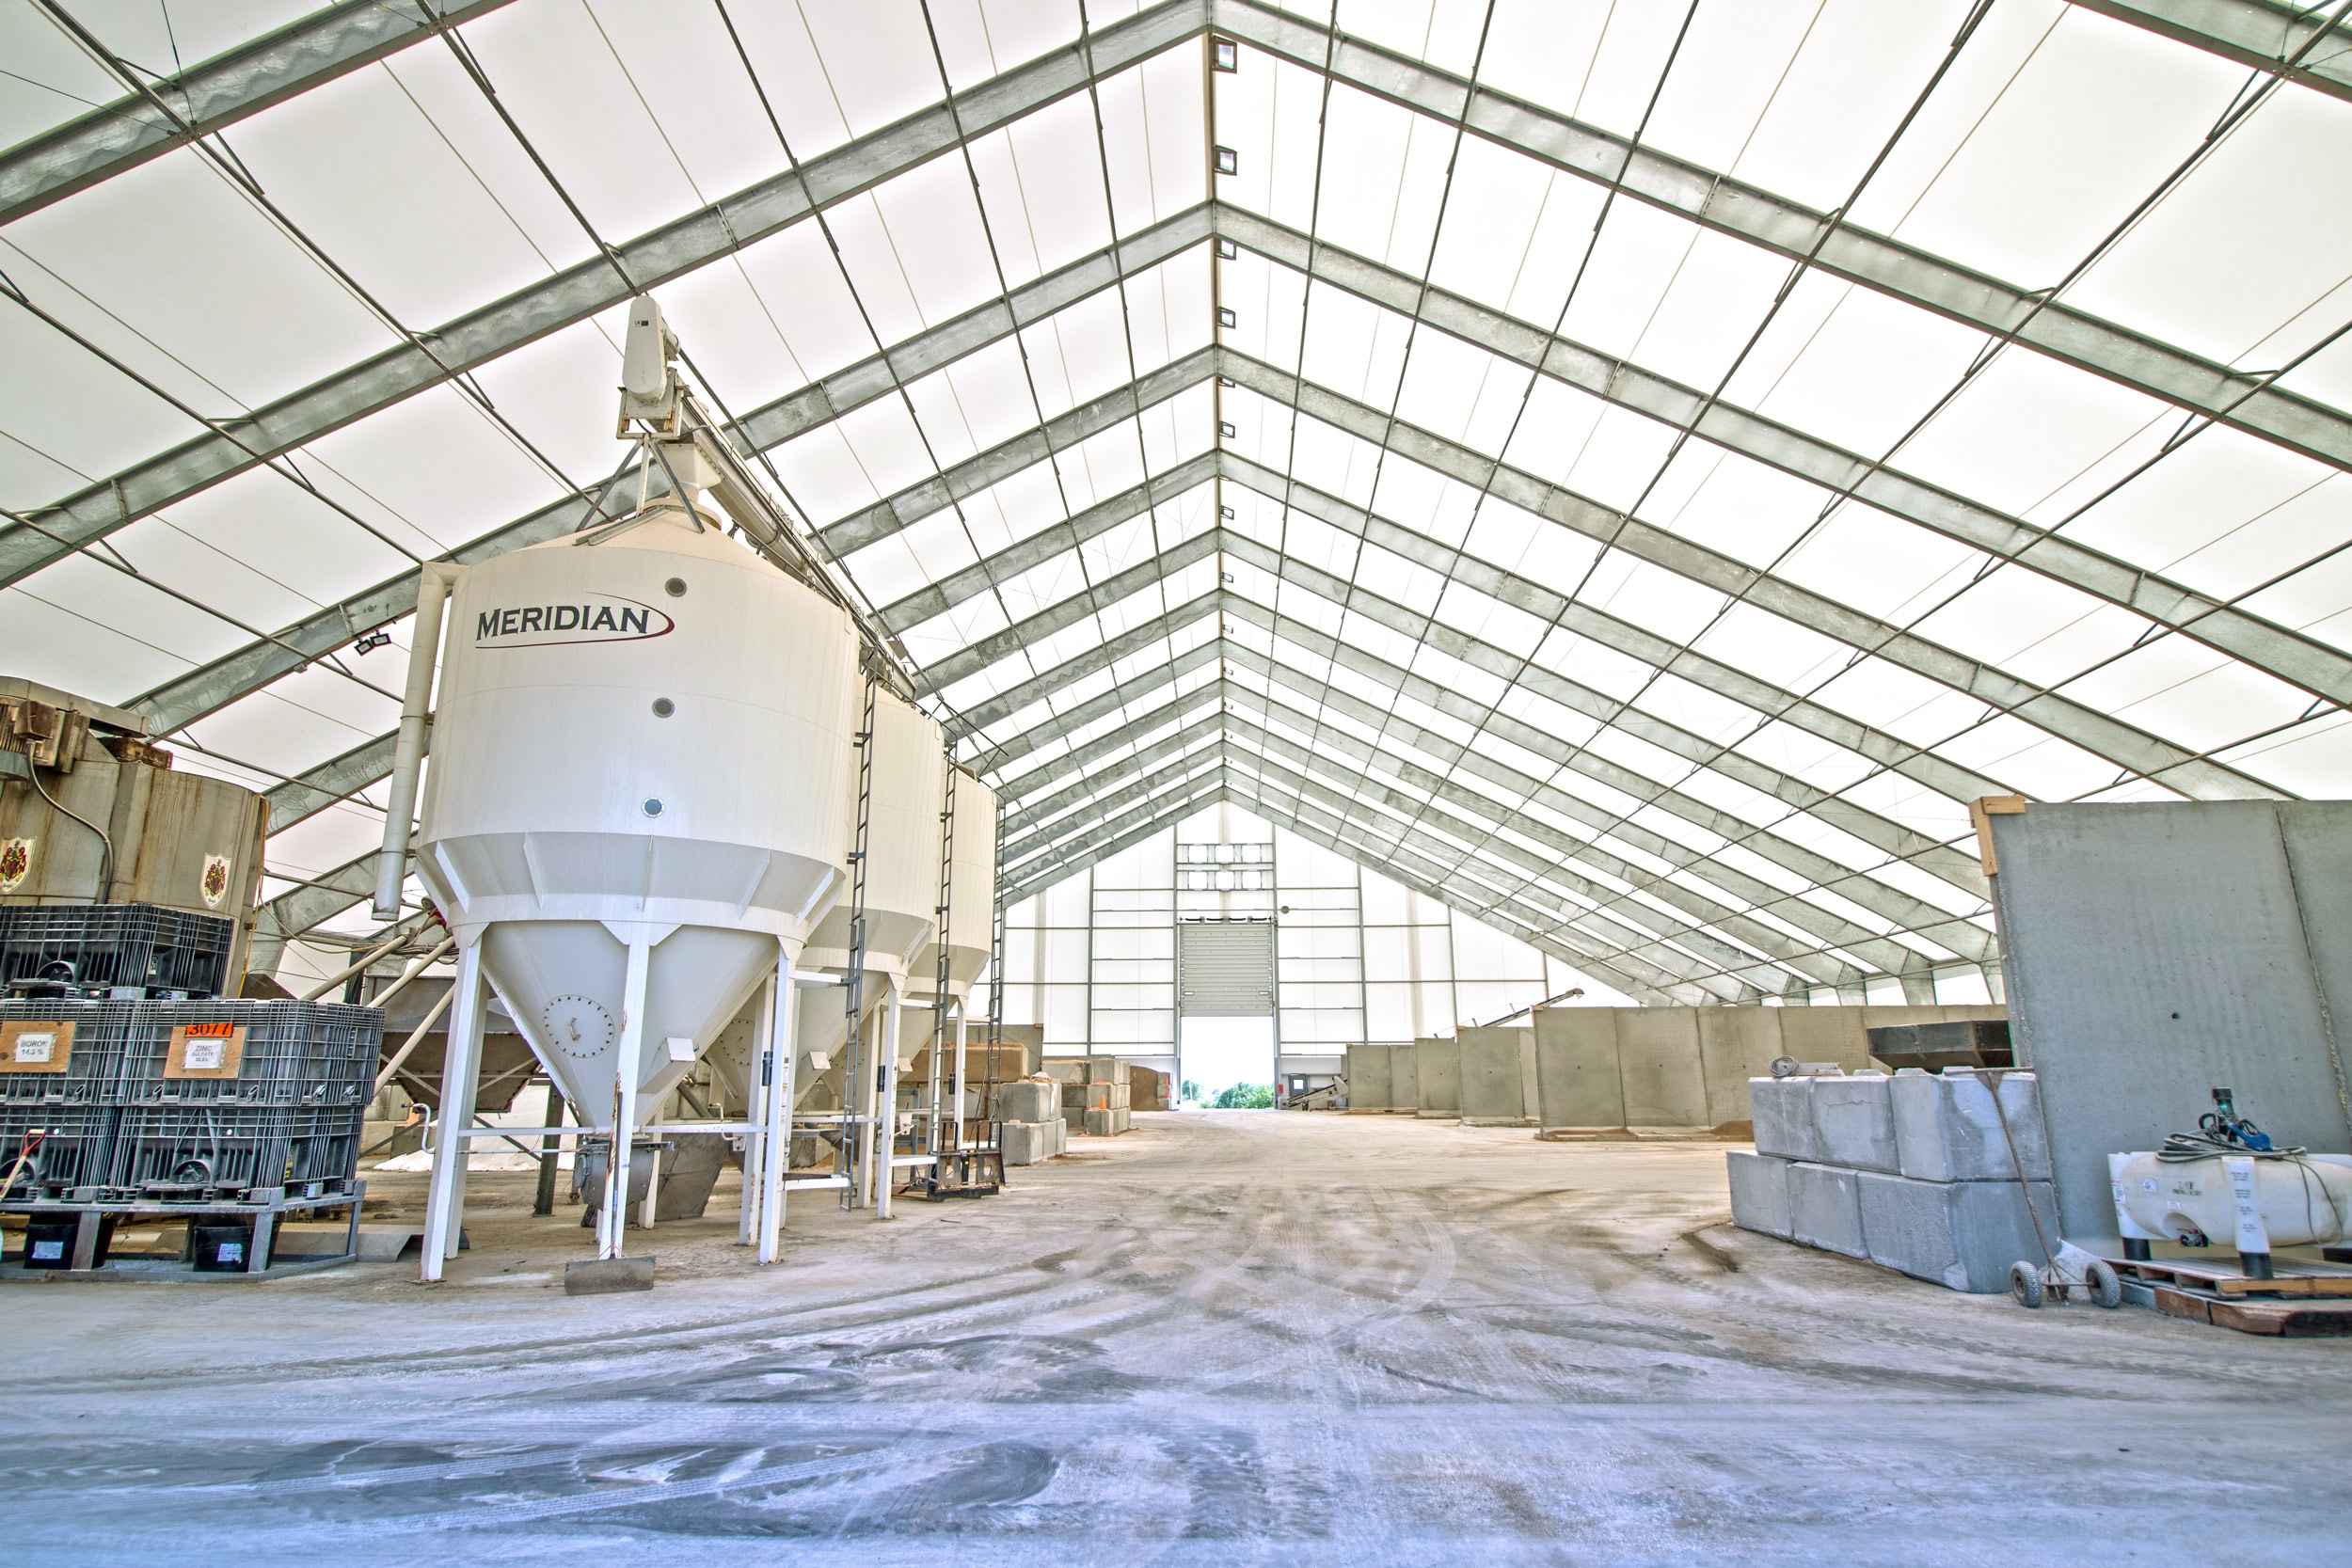 fabric fertilizer storage